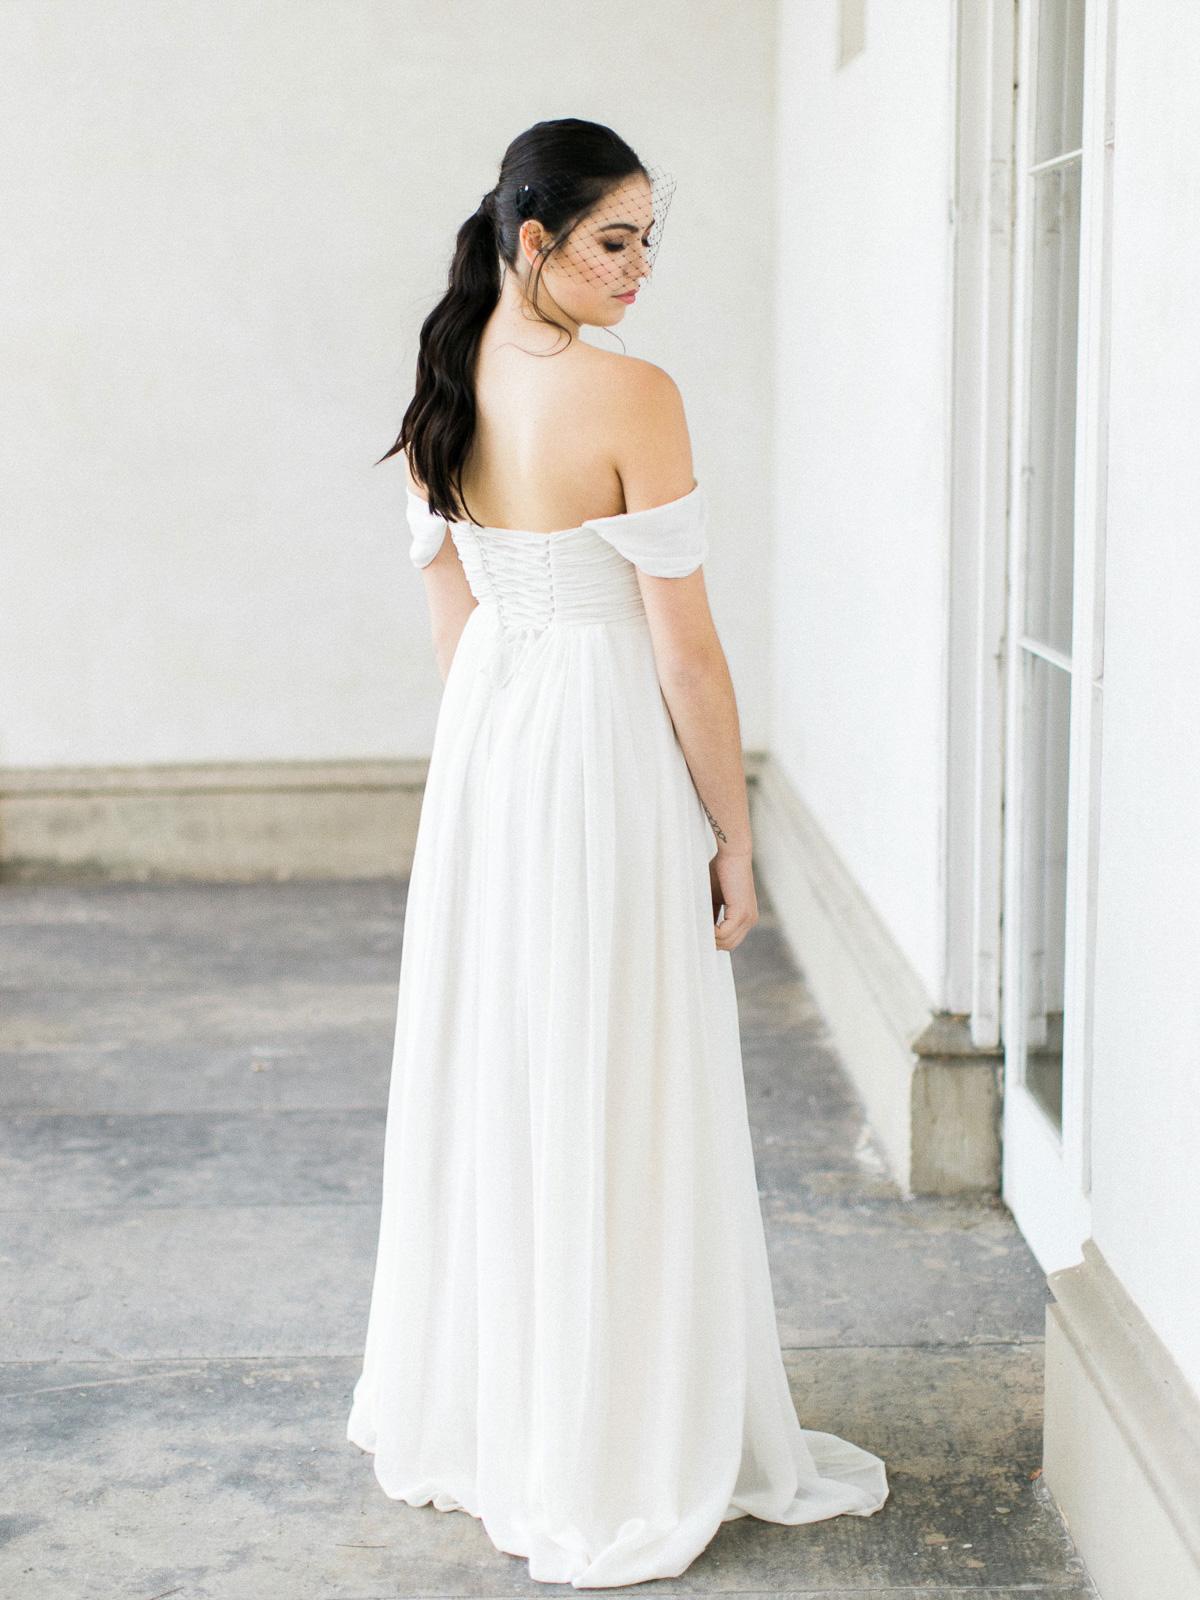 kurtz-orpia-photography-vineyard-bride-swish-list-dundurn-castle-dundas-wedding-editorial-21.jpg